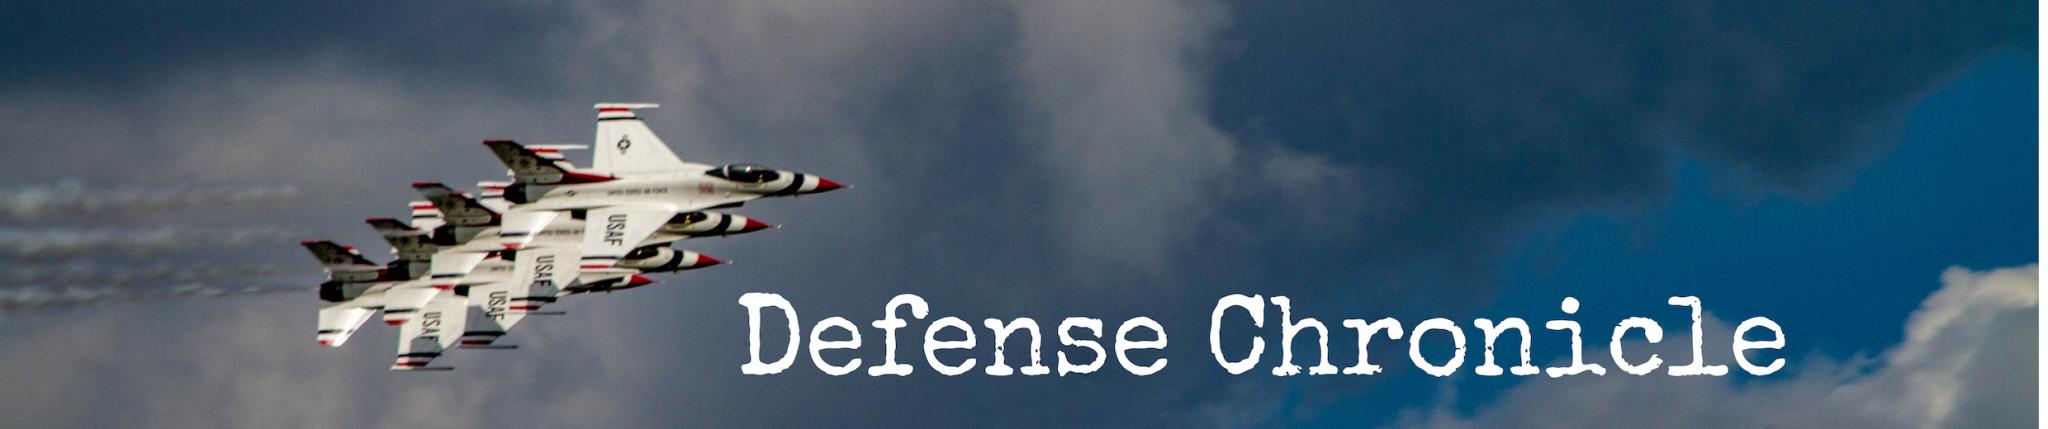 Defense Chronicle